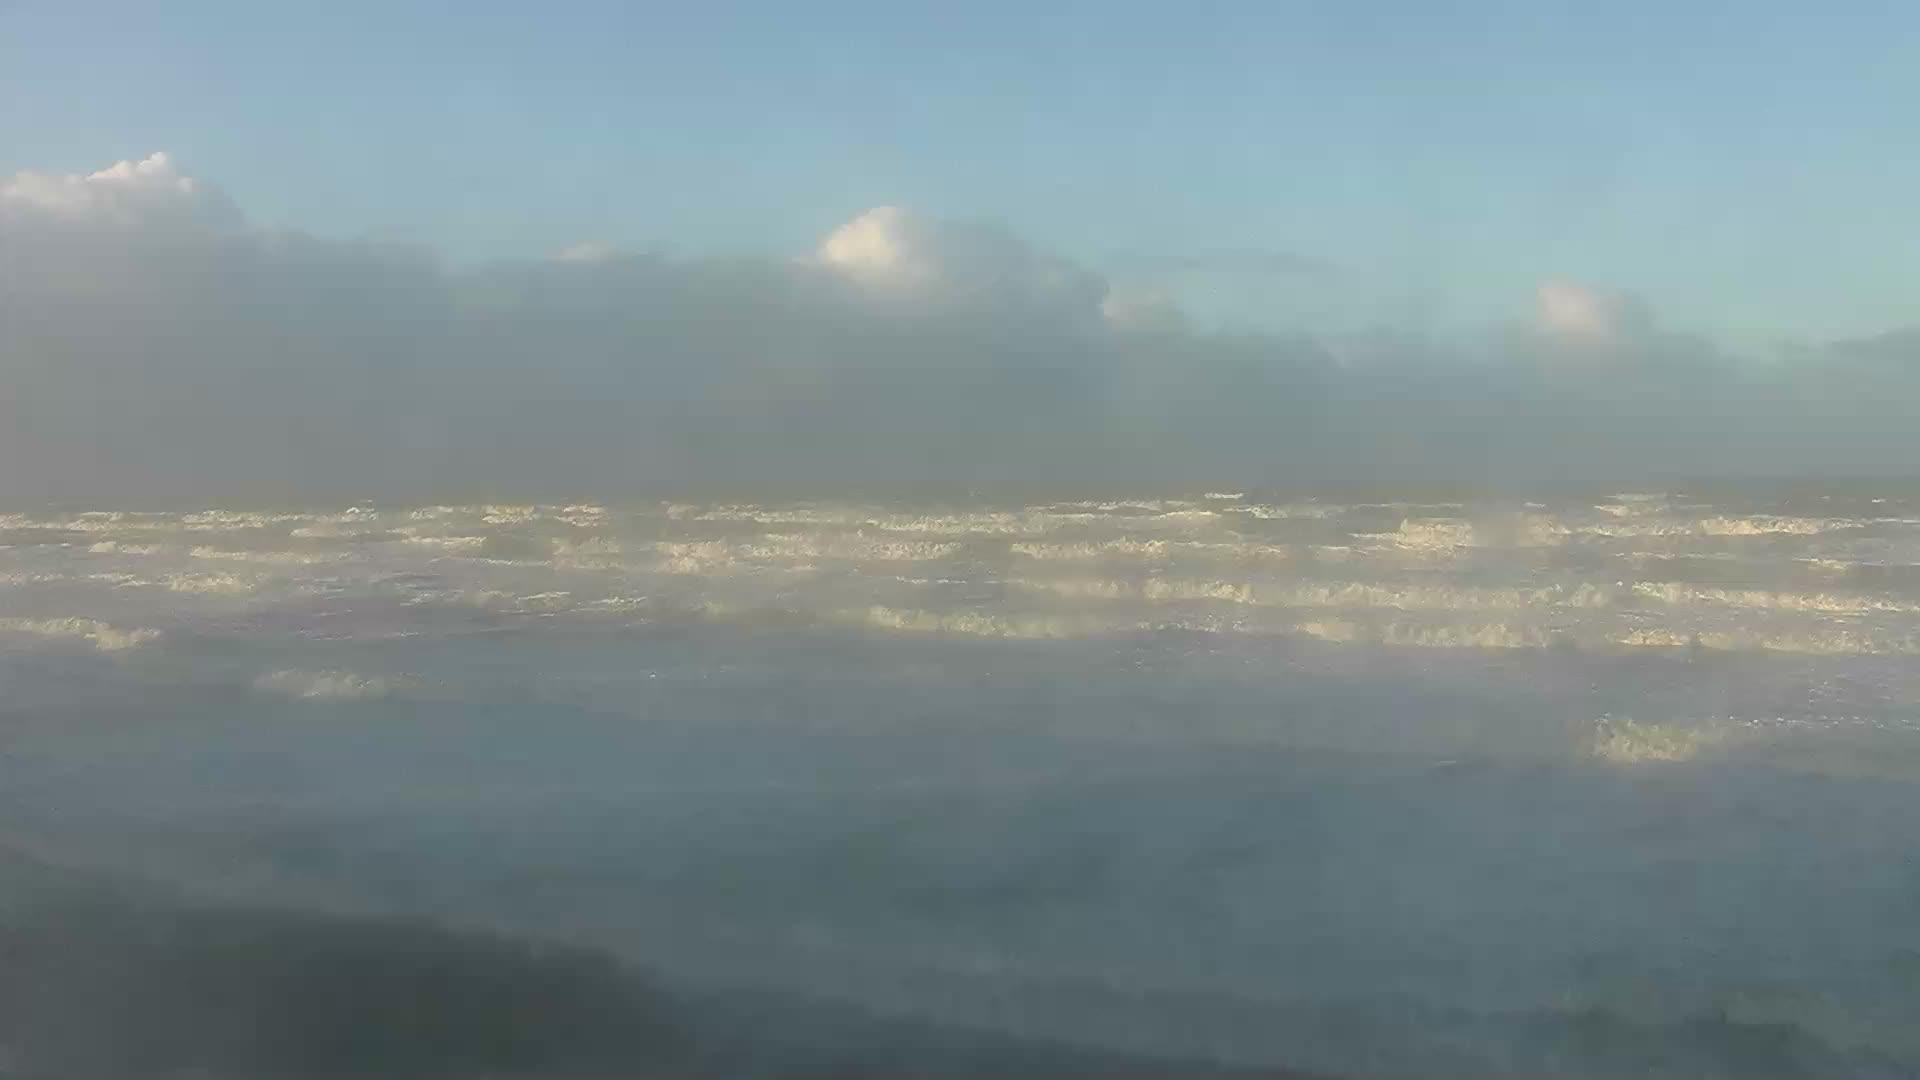 Webkamera Merlimont-Plage: Merlimont-La plage